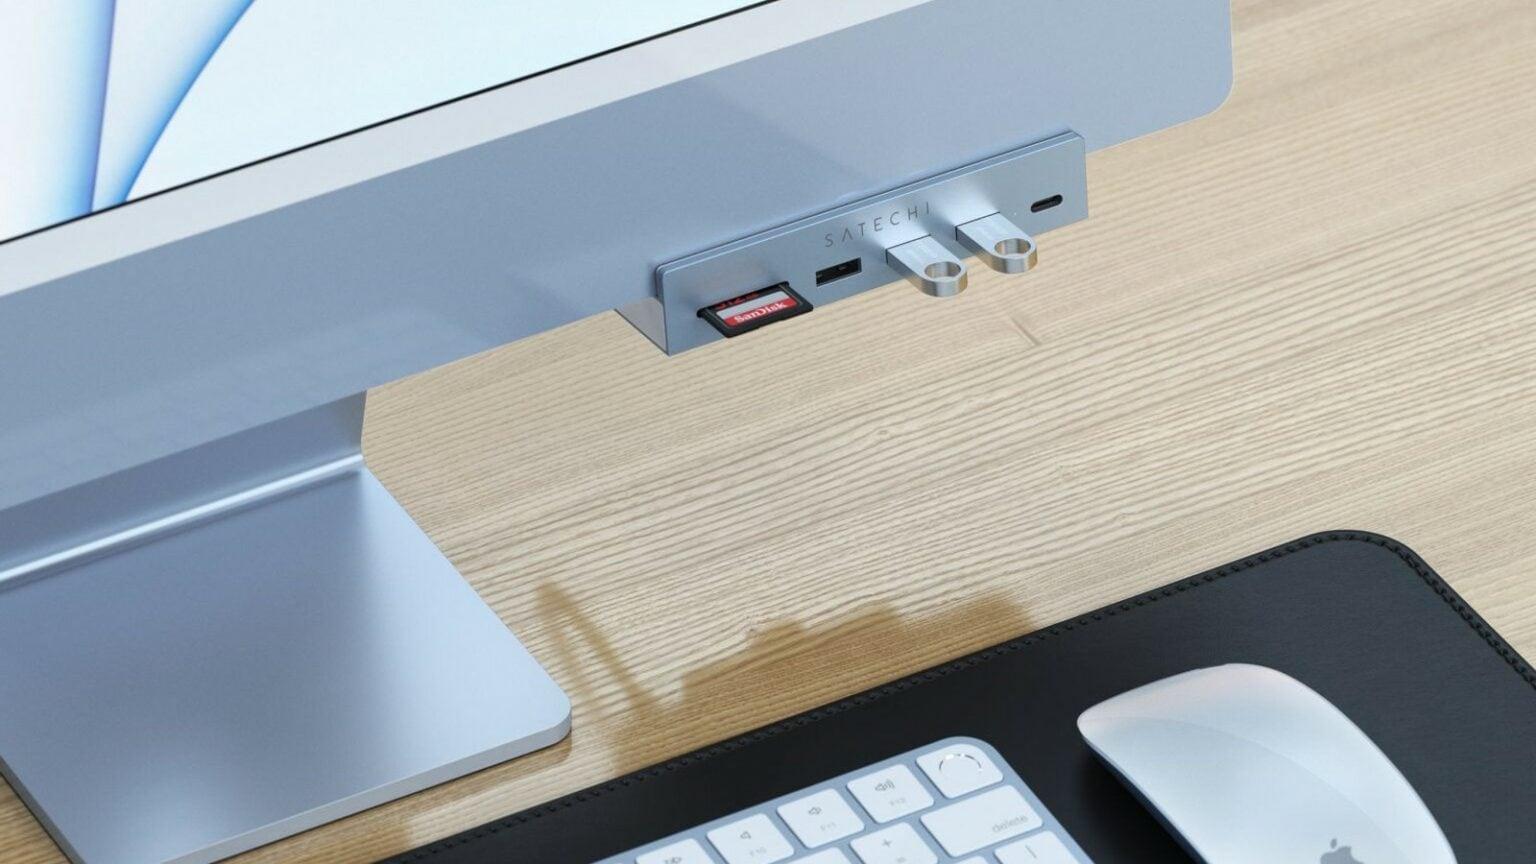 Satechi Clamp Hub for M1 iMac